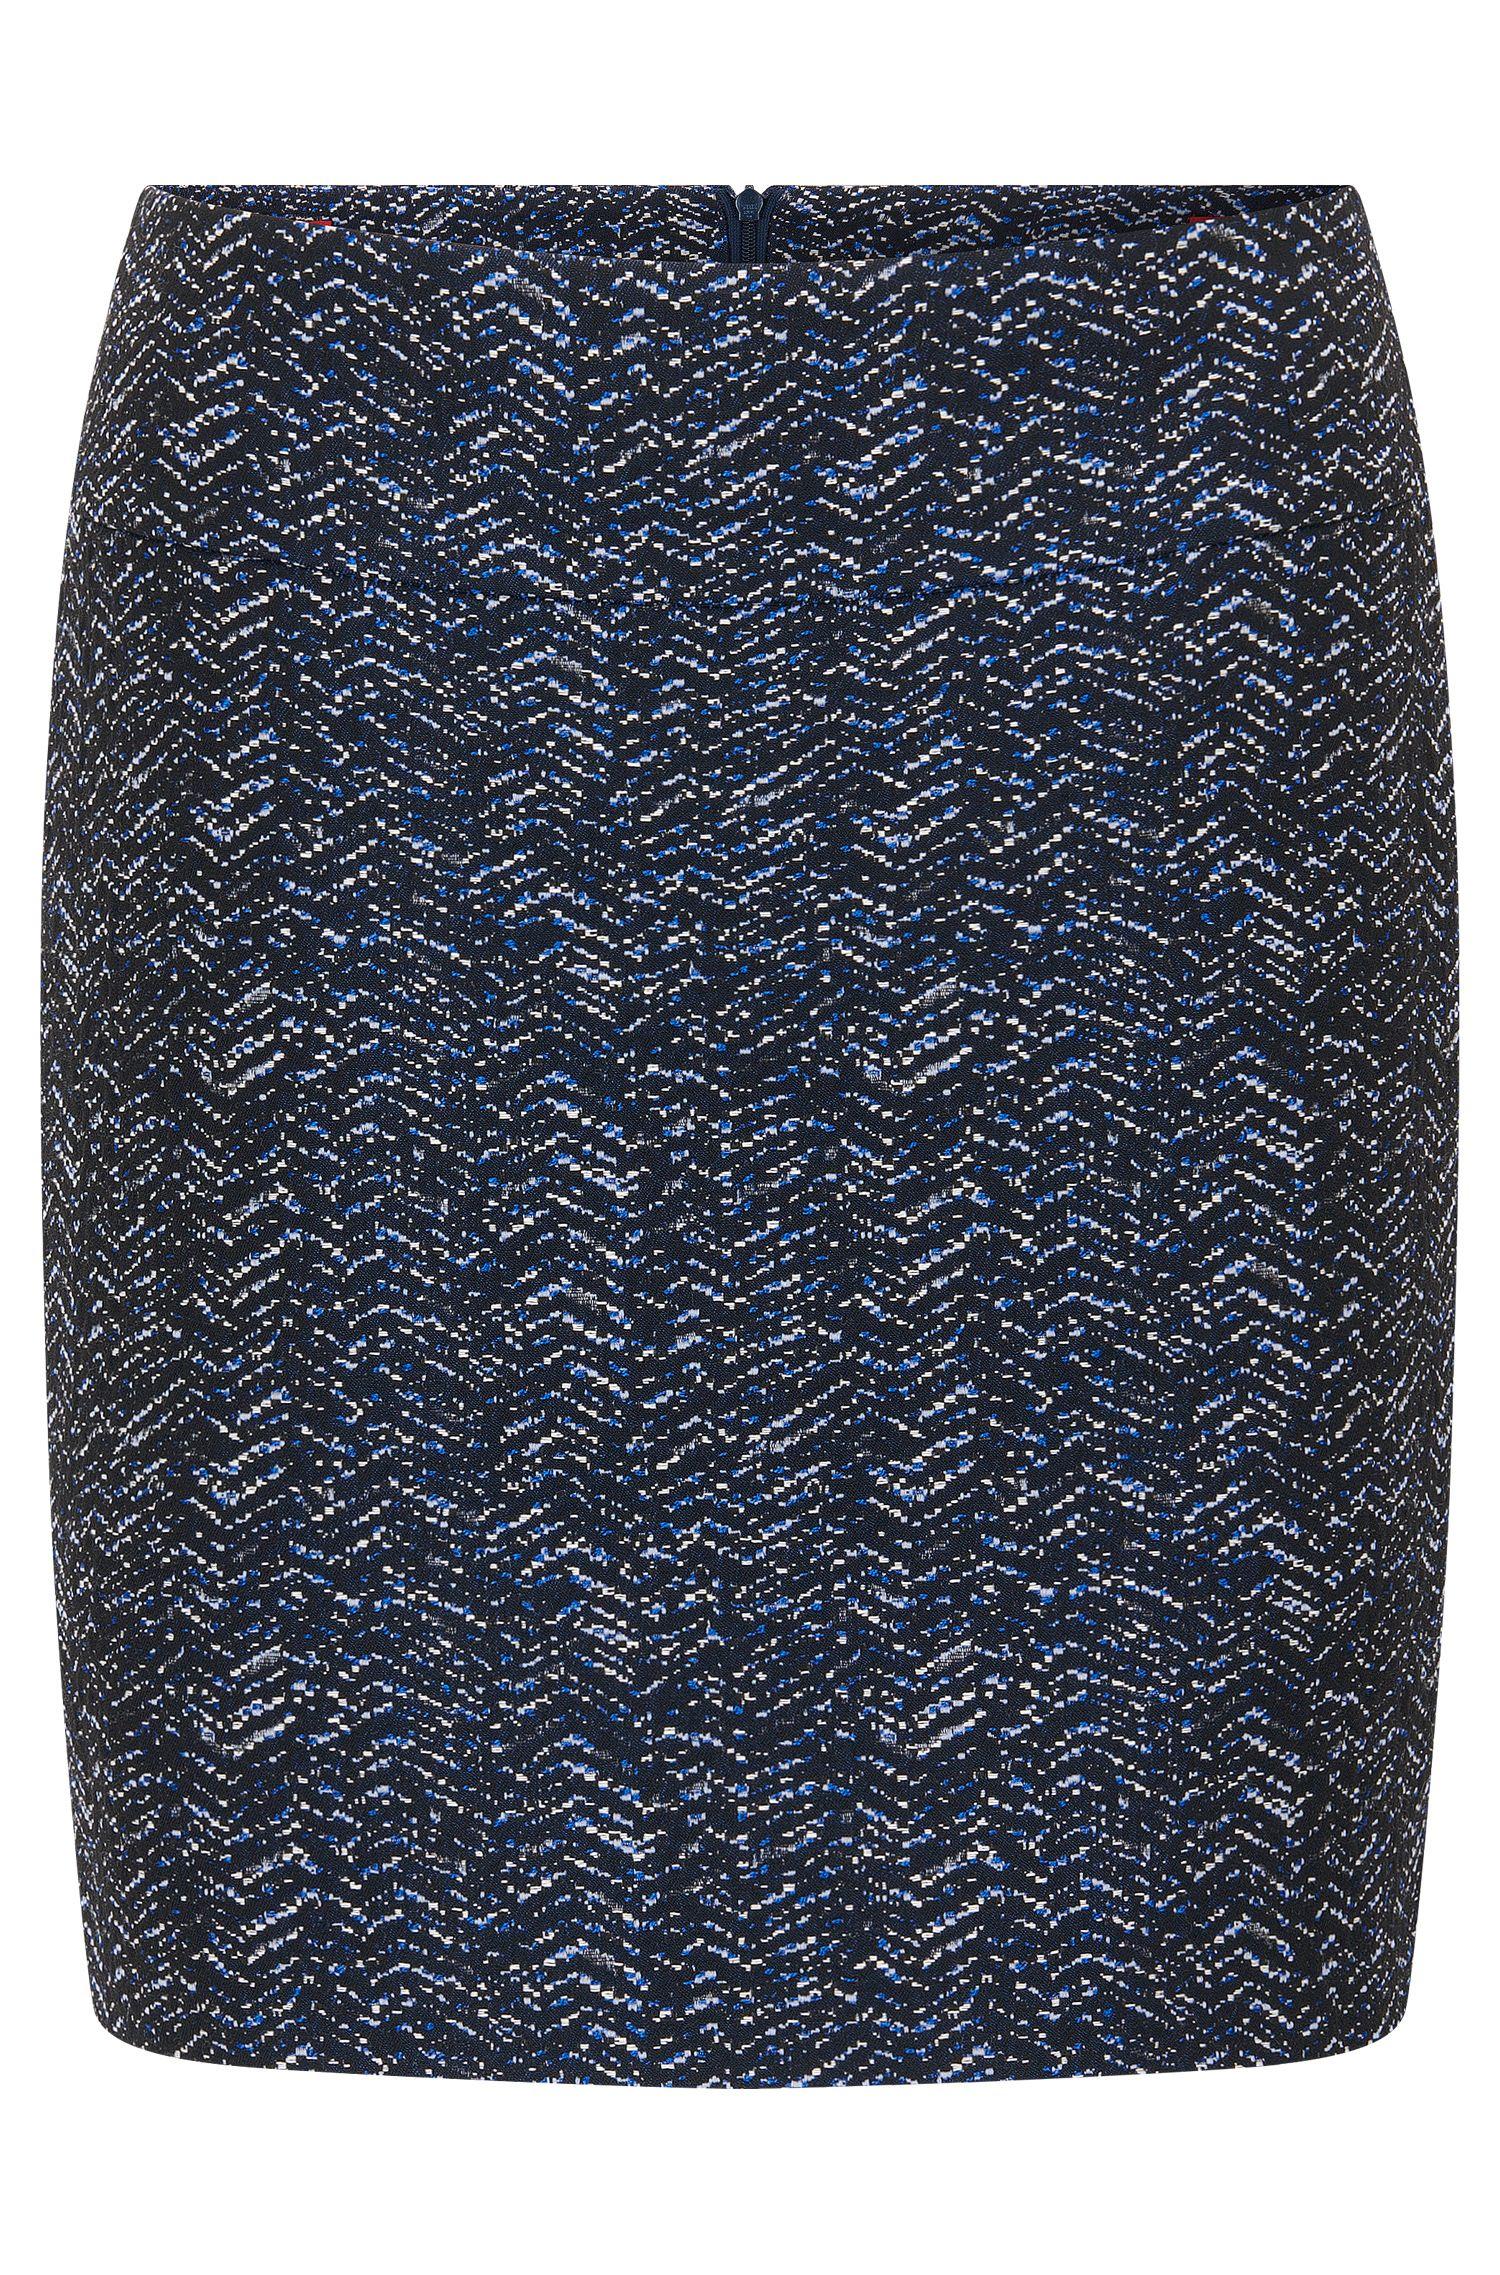 Mini skirt in yarn-dyed jacquard